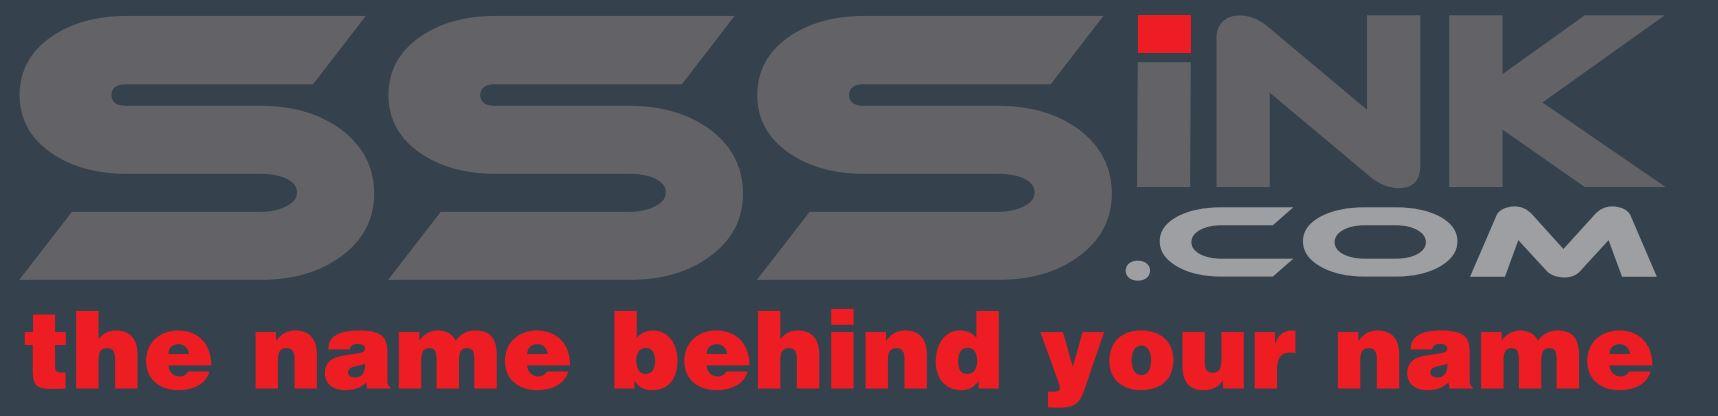 ScreenSpecialtyShop-Logo.JPG